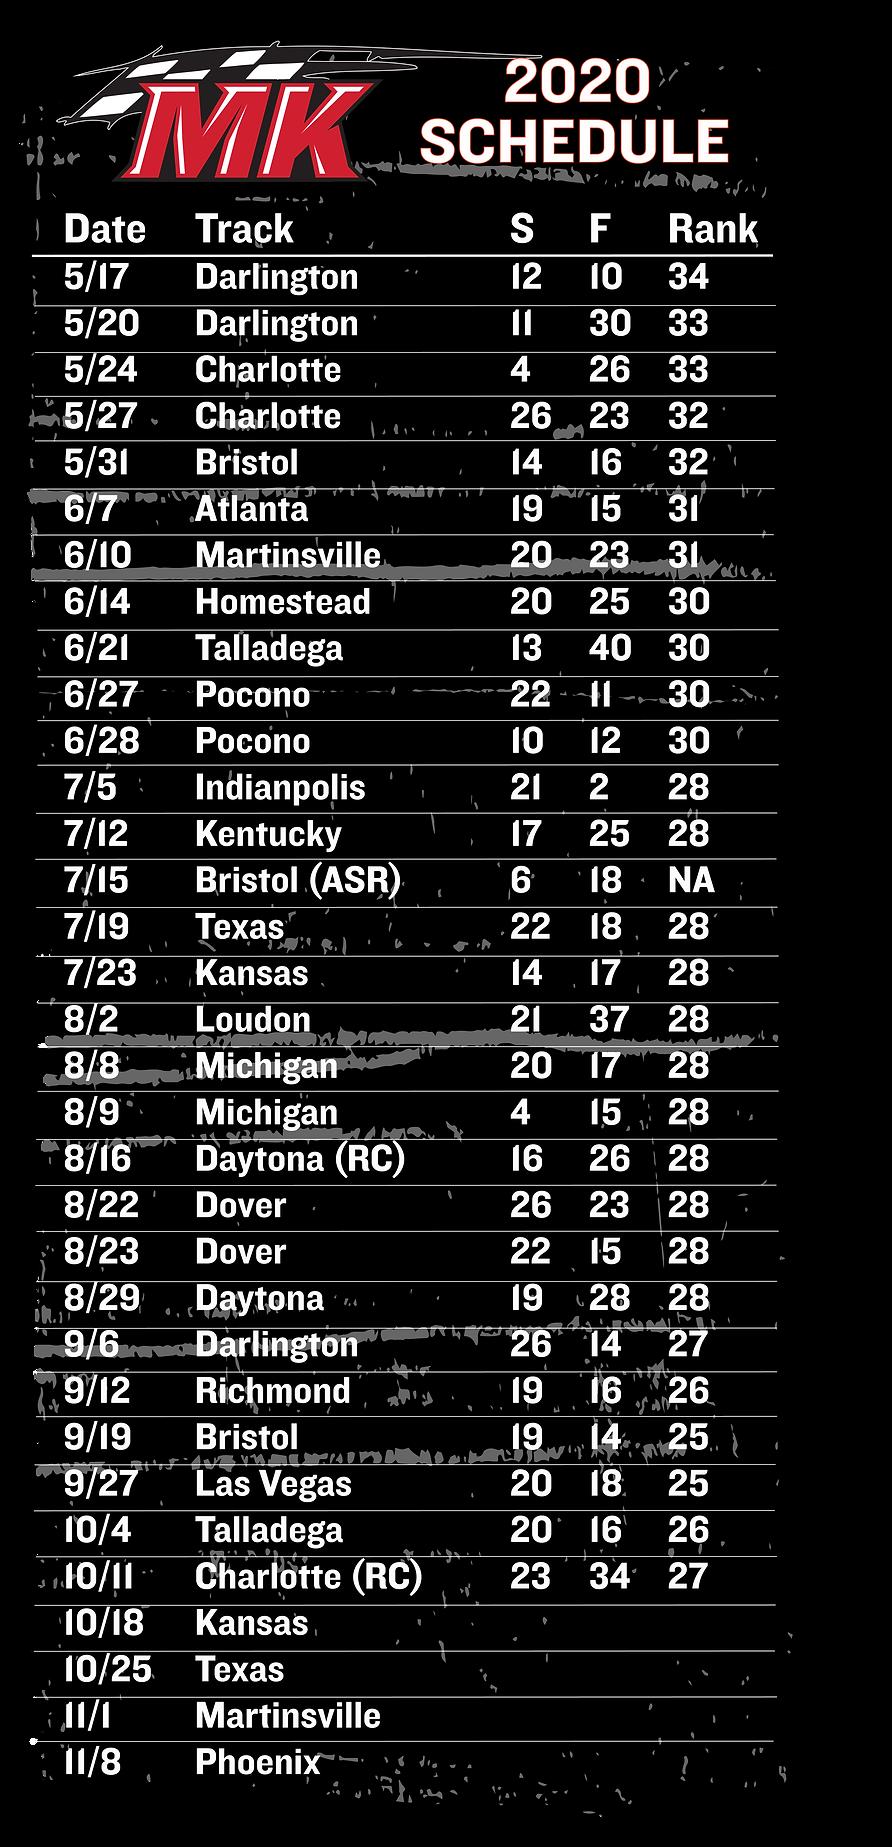 MK 2020 Schedule 10-12.png